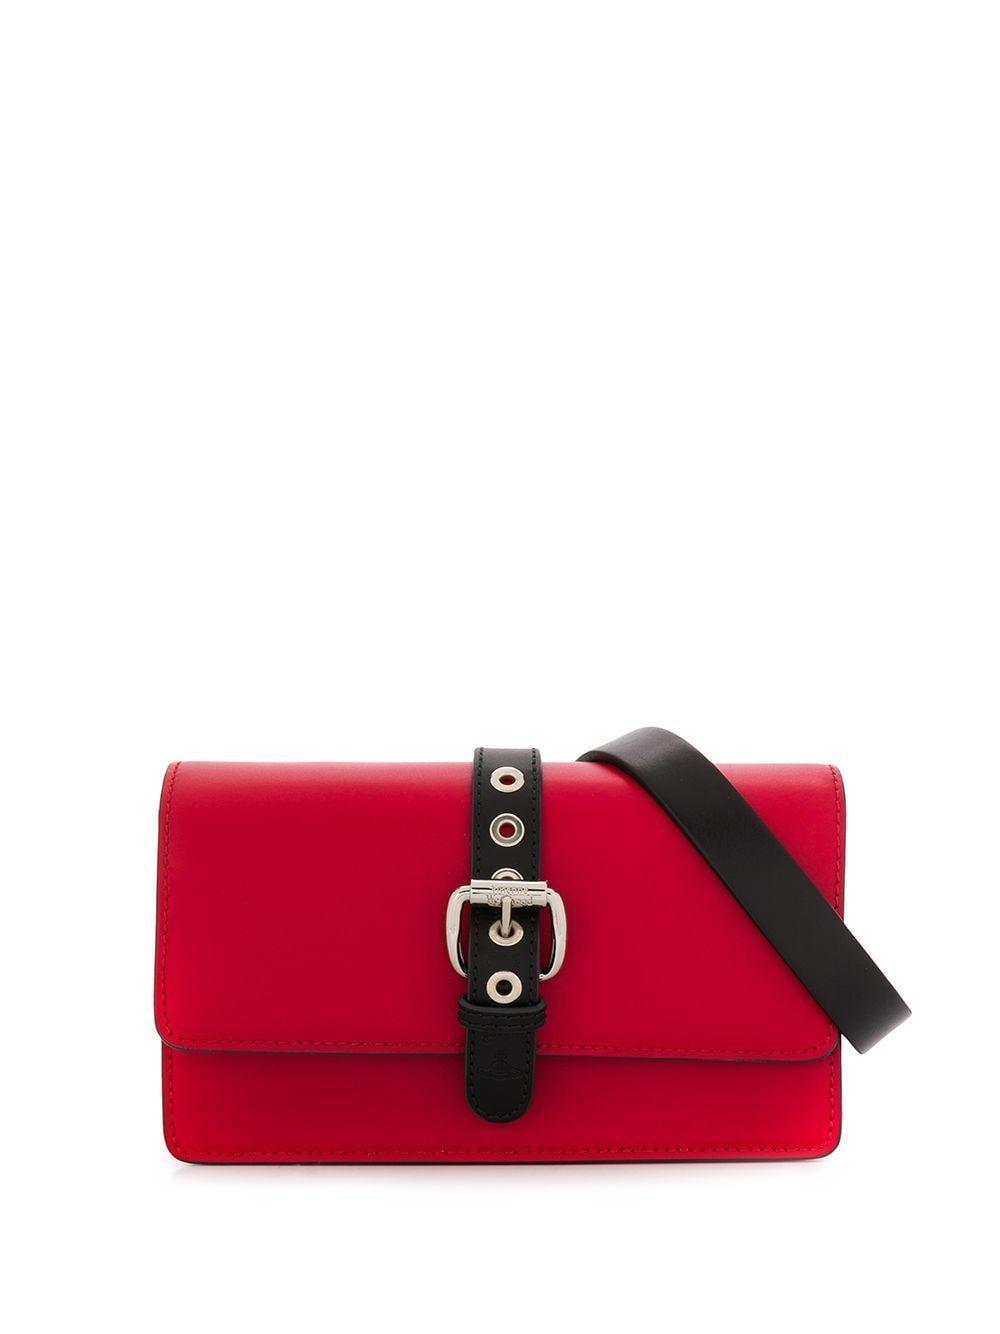 VIVIENNE WESTWOOD WOMEN'S 4307000440242LAH402 RED LEATHER BELT BAG